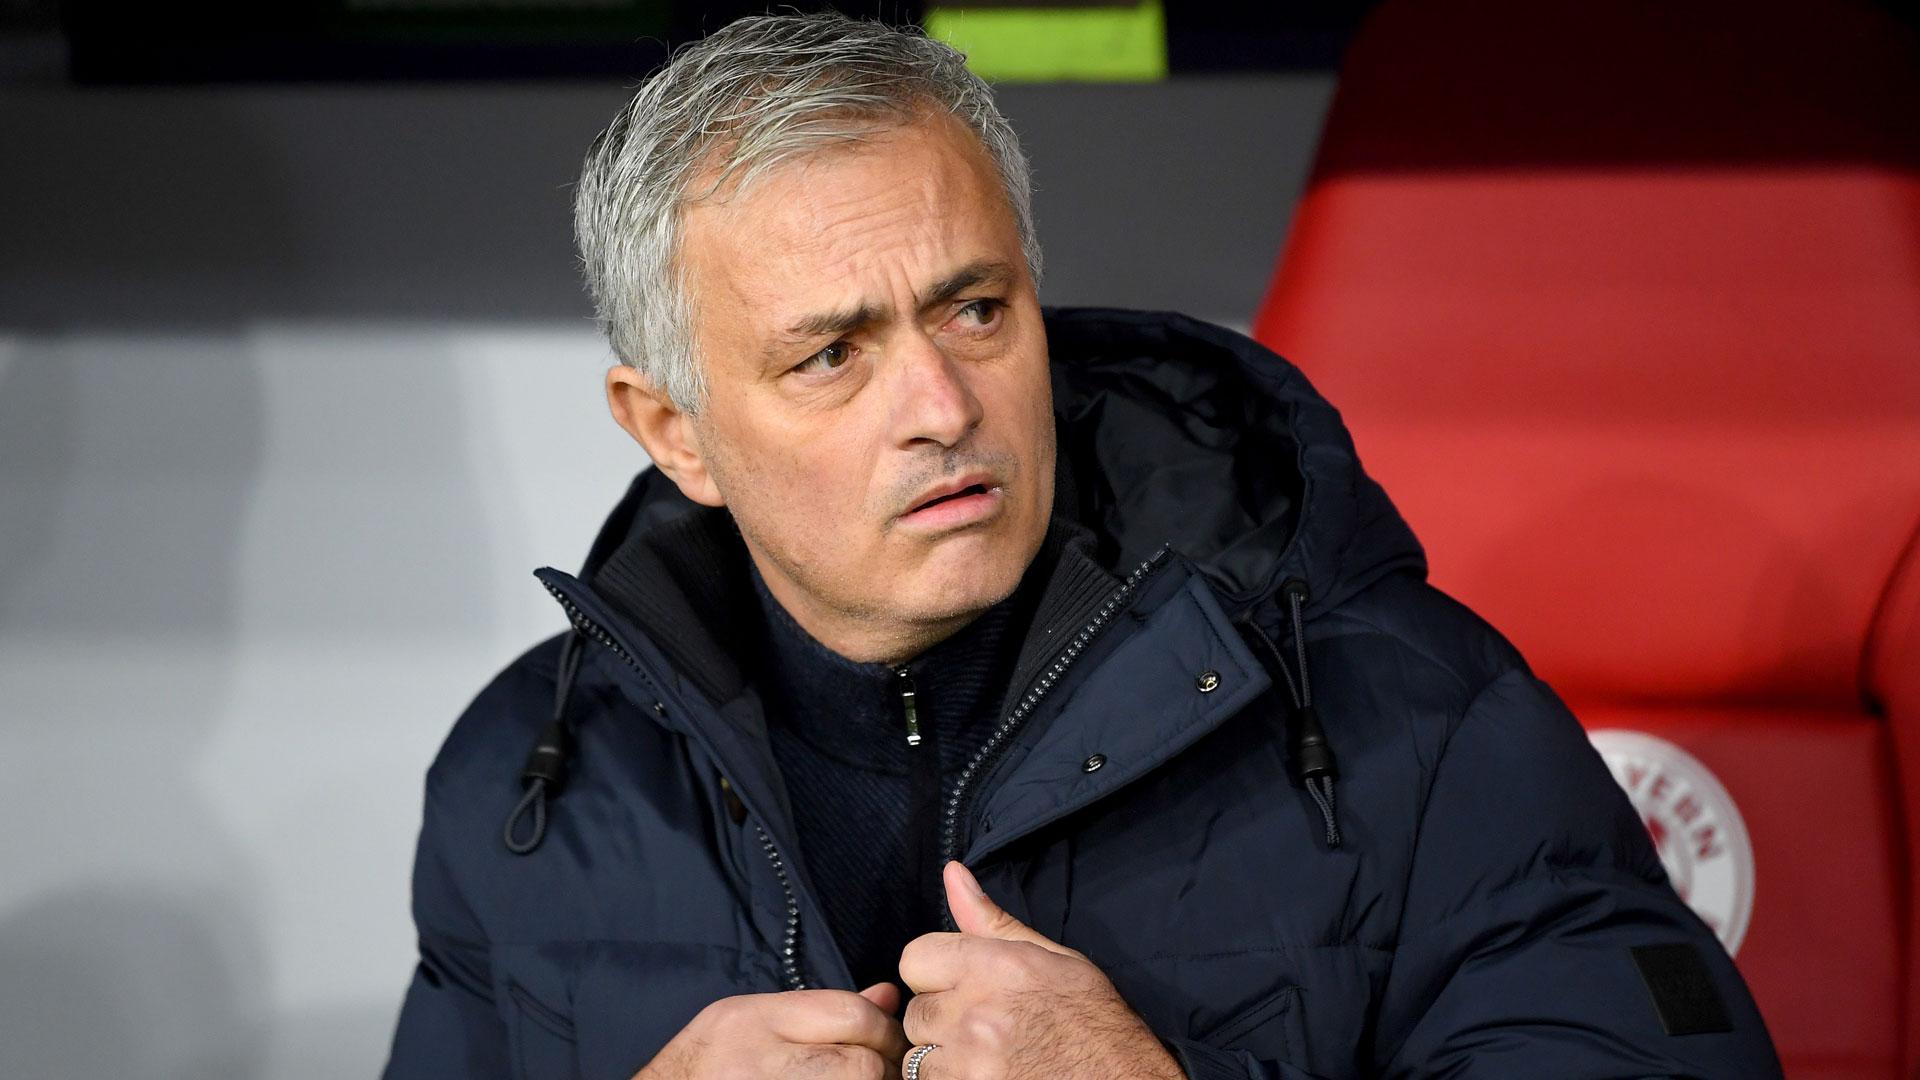 Mauricio Pochettino: Former Tottenham manager 'open to listen' to job offers